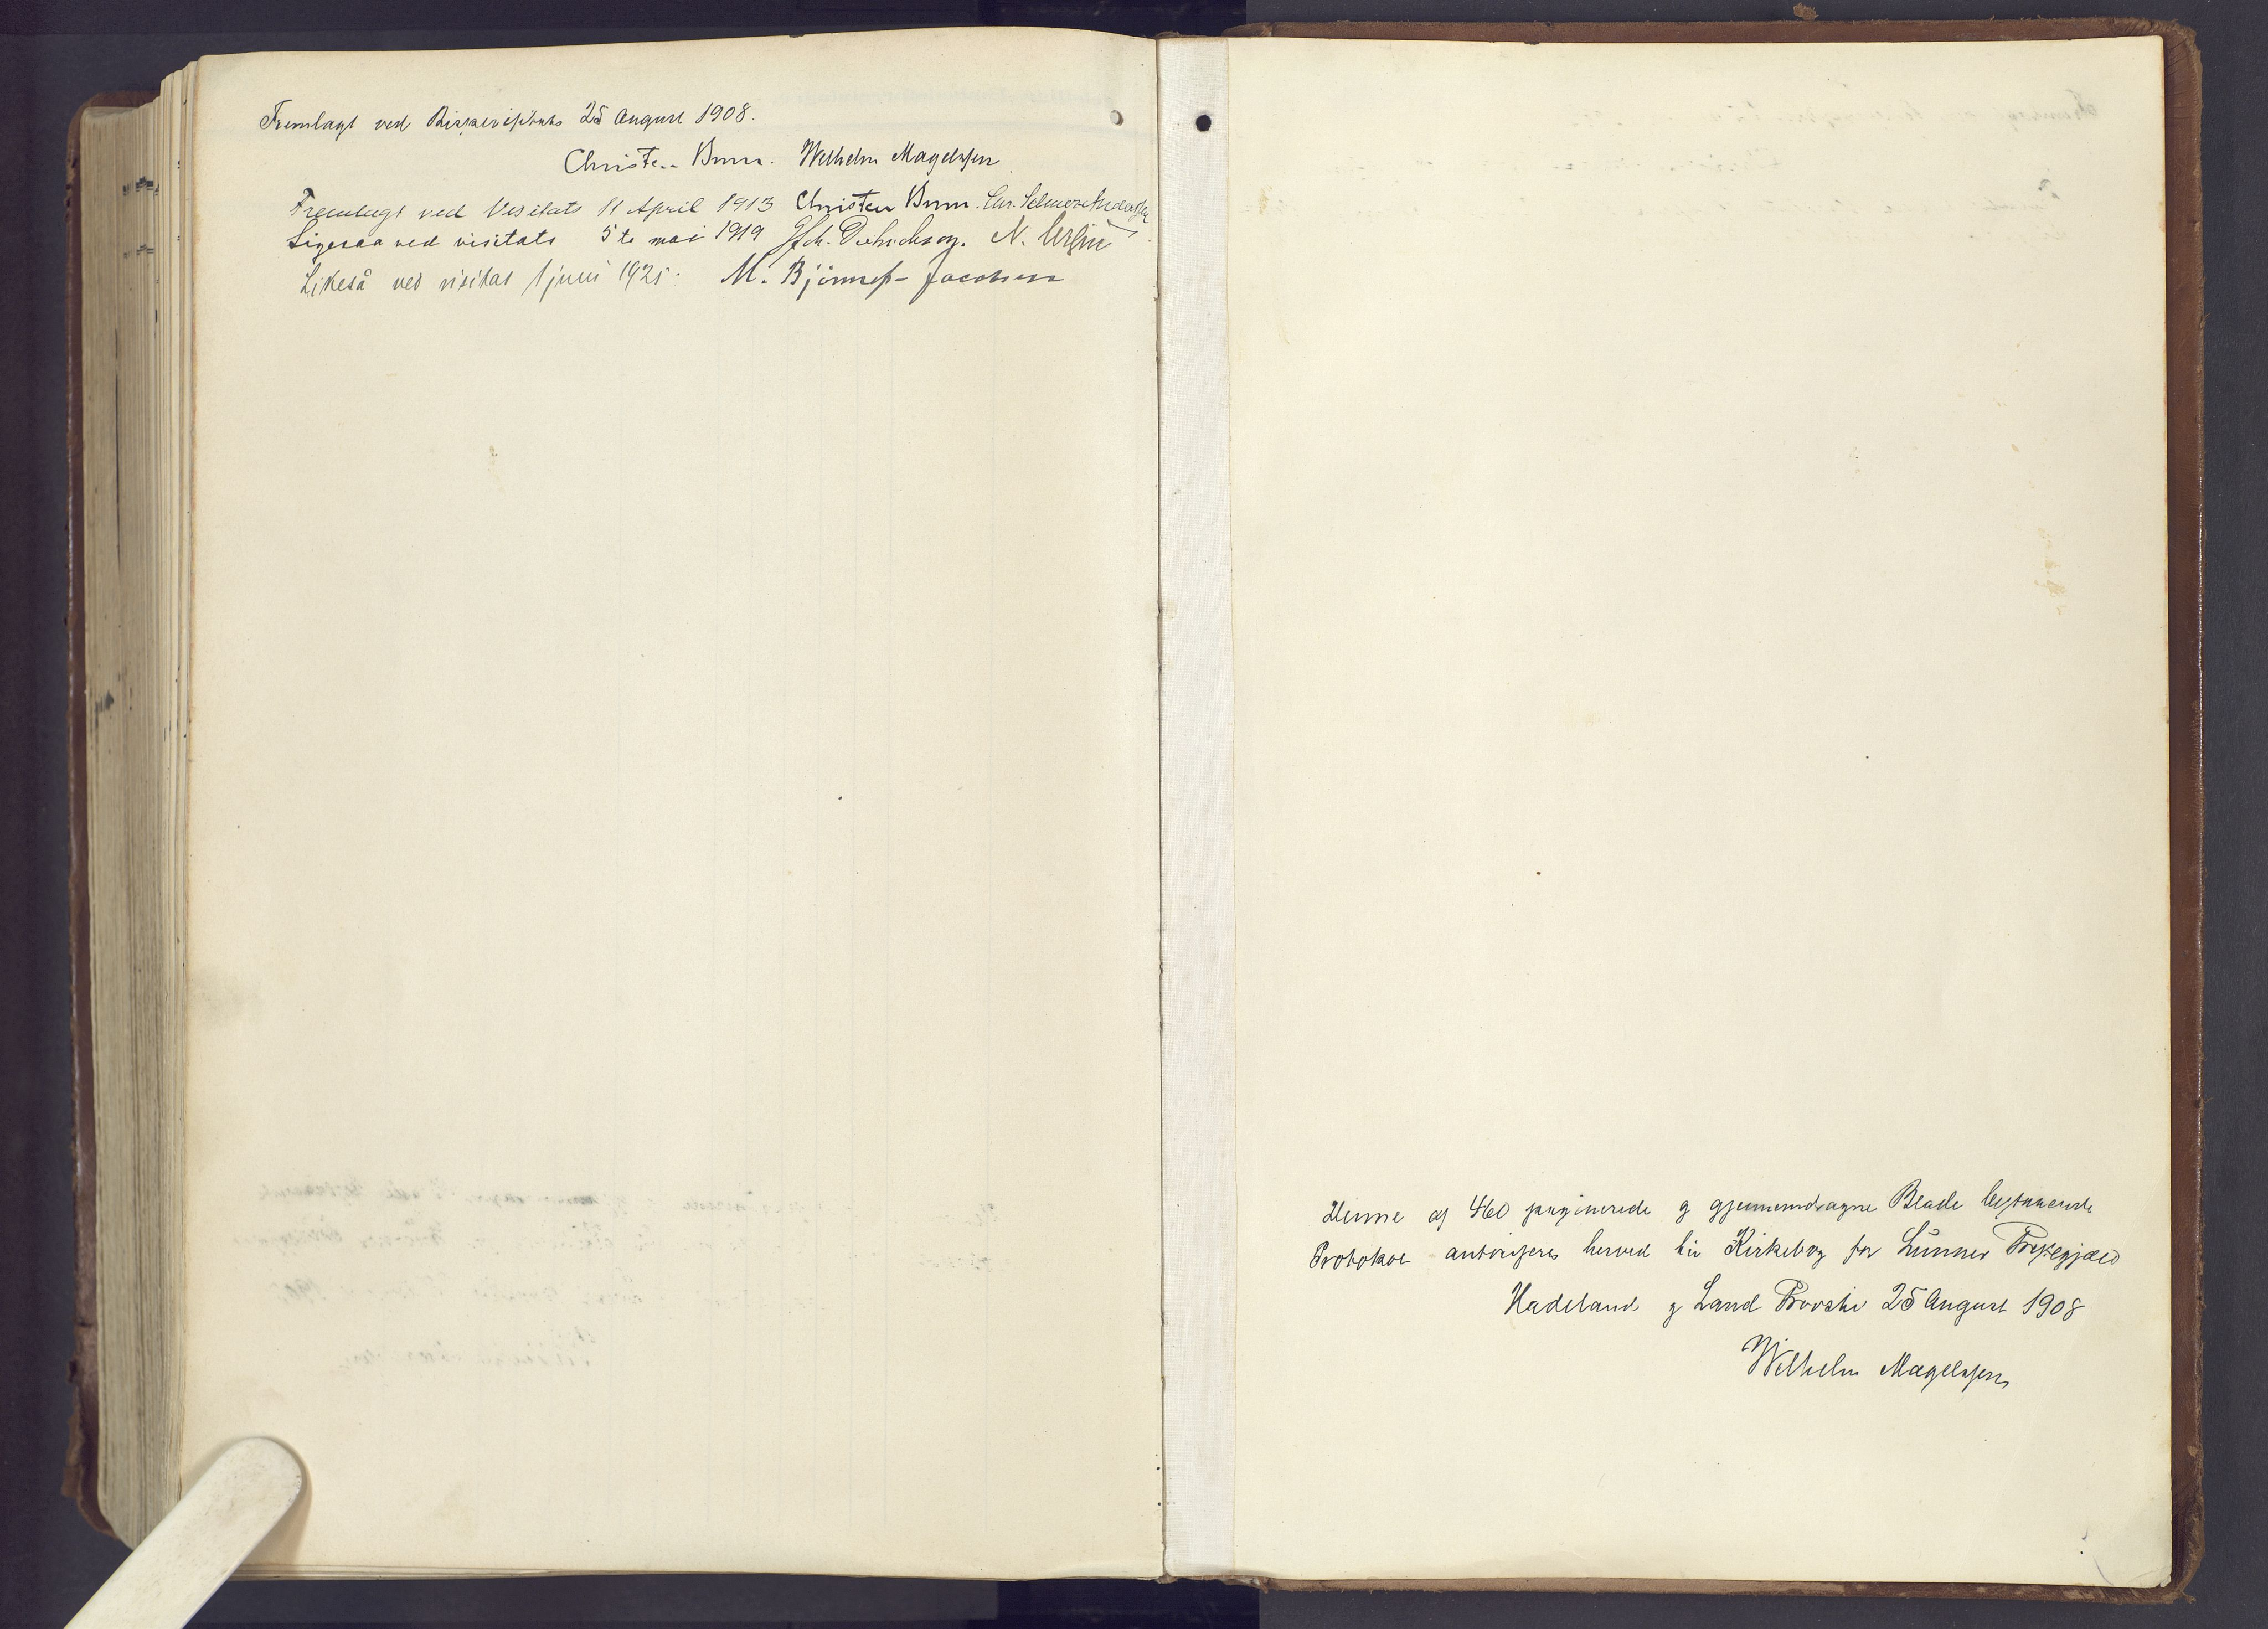 SAH, Lunner prestekontor, H/Ha/Haa/L0001: Ministerialbok nr. 1, 1907-1922